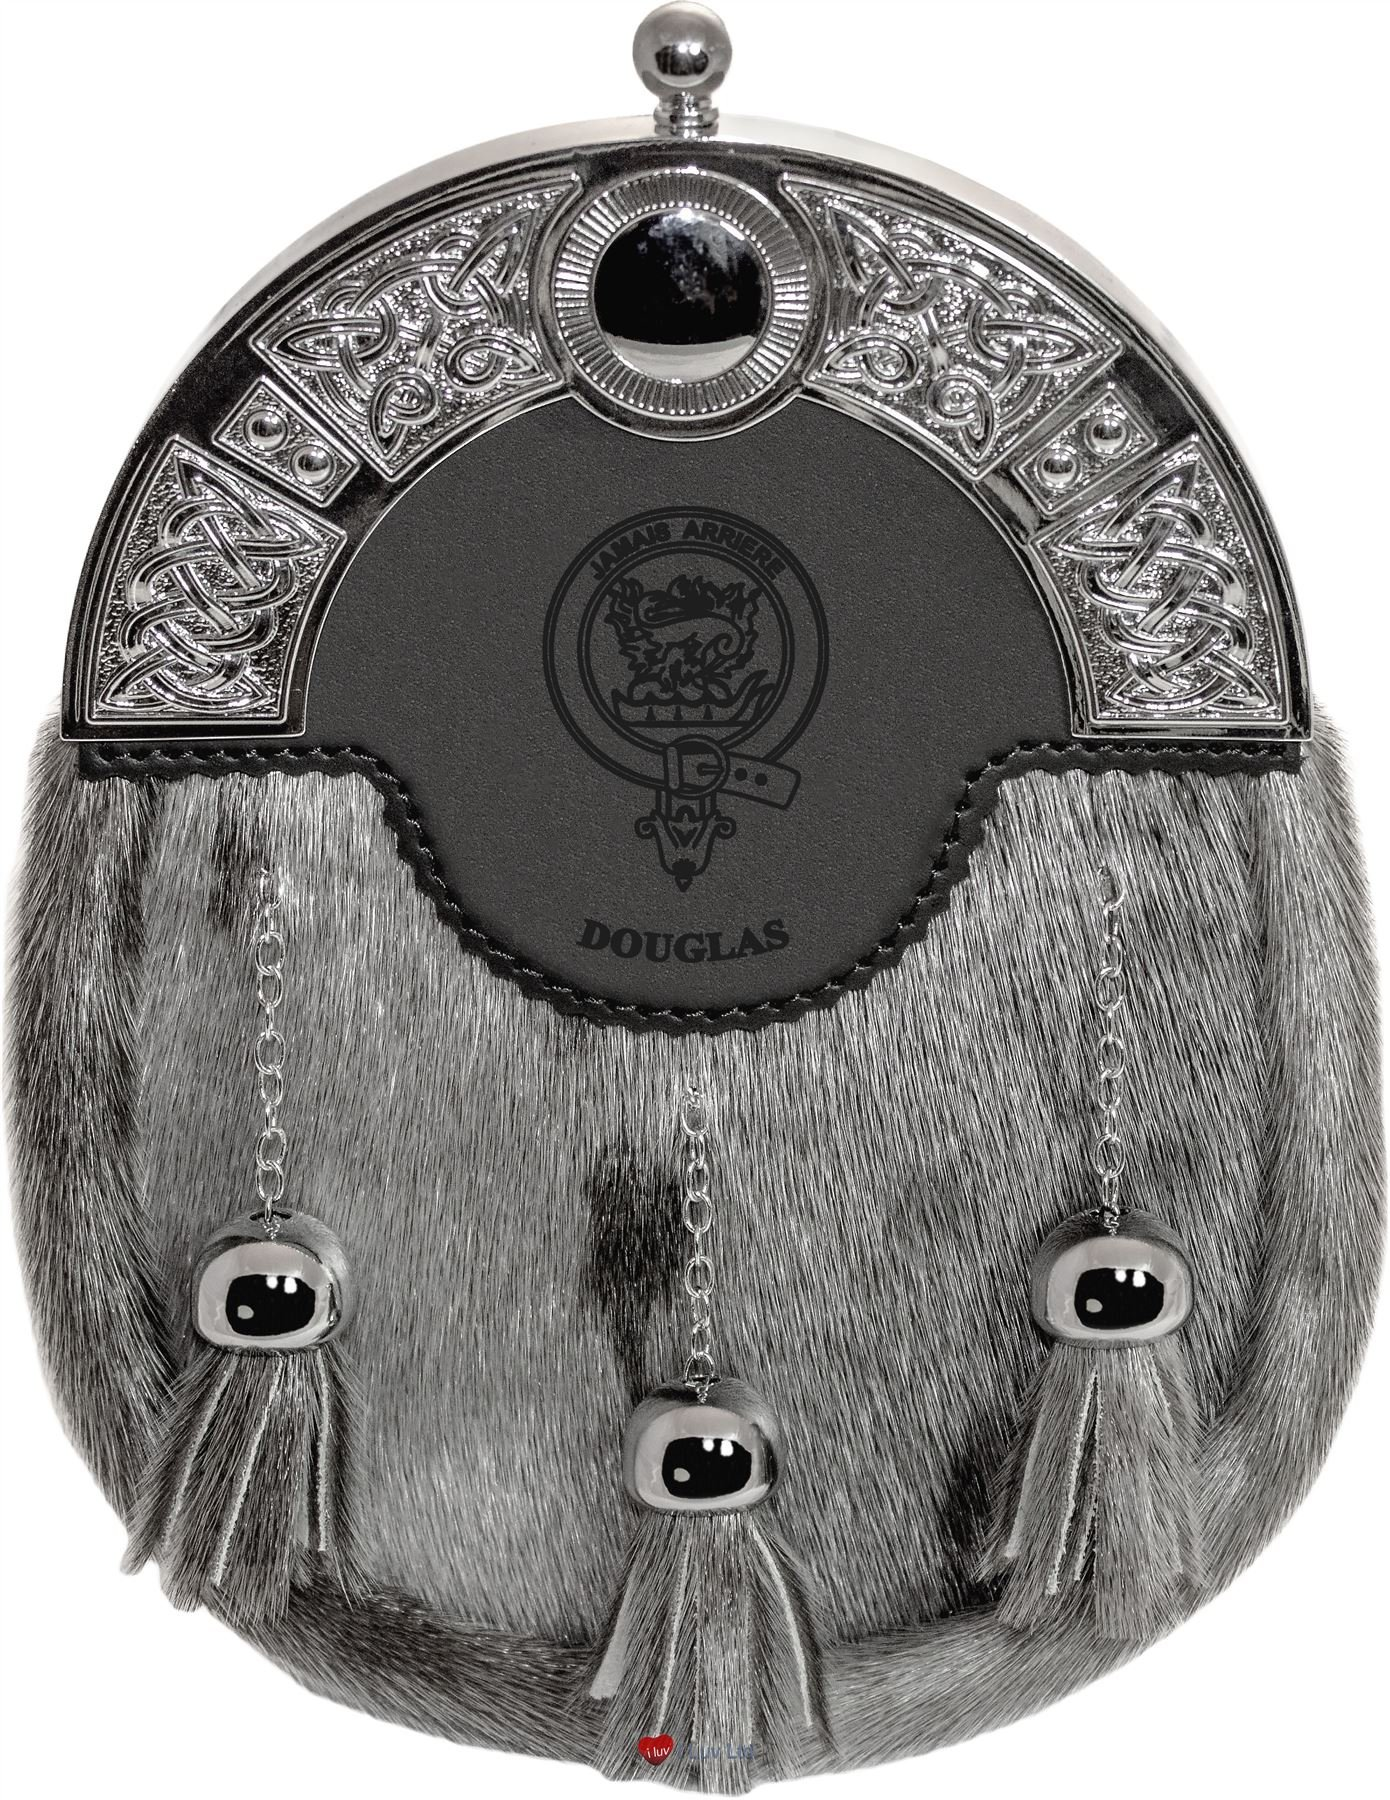 Douglas Dress Sporran 3 Tassels Studded Targe Celtic Arch Scottish Clan Name Crest